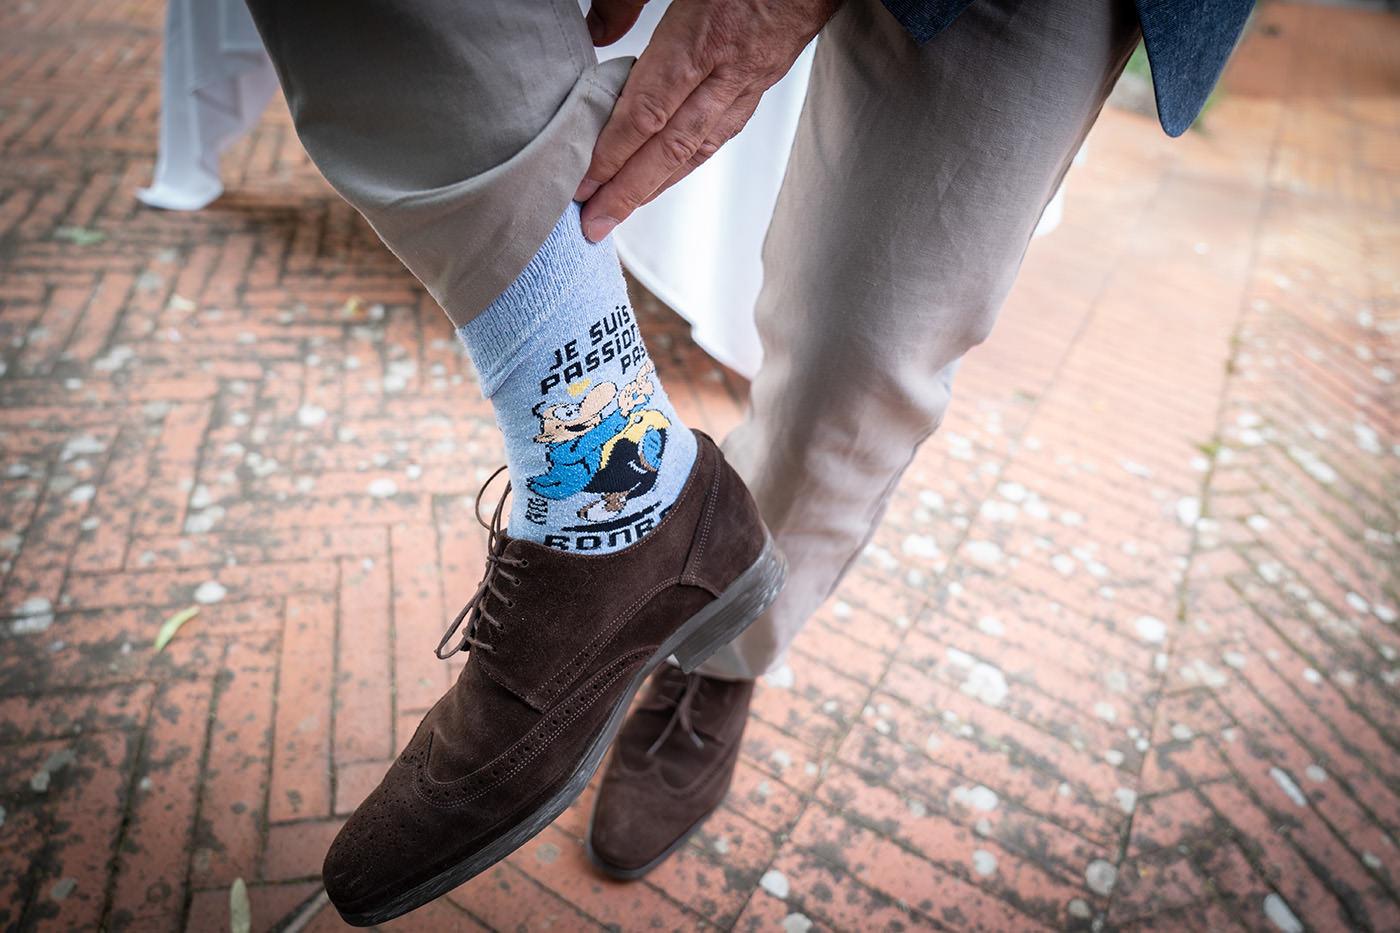 Same-Sex Wedding Photographer Florence: Timur & Guillaume. Wedding socks!